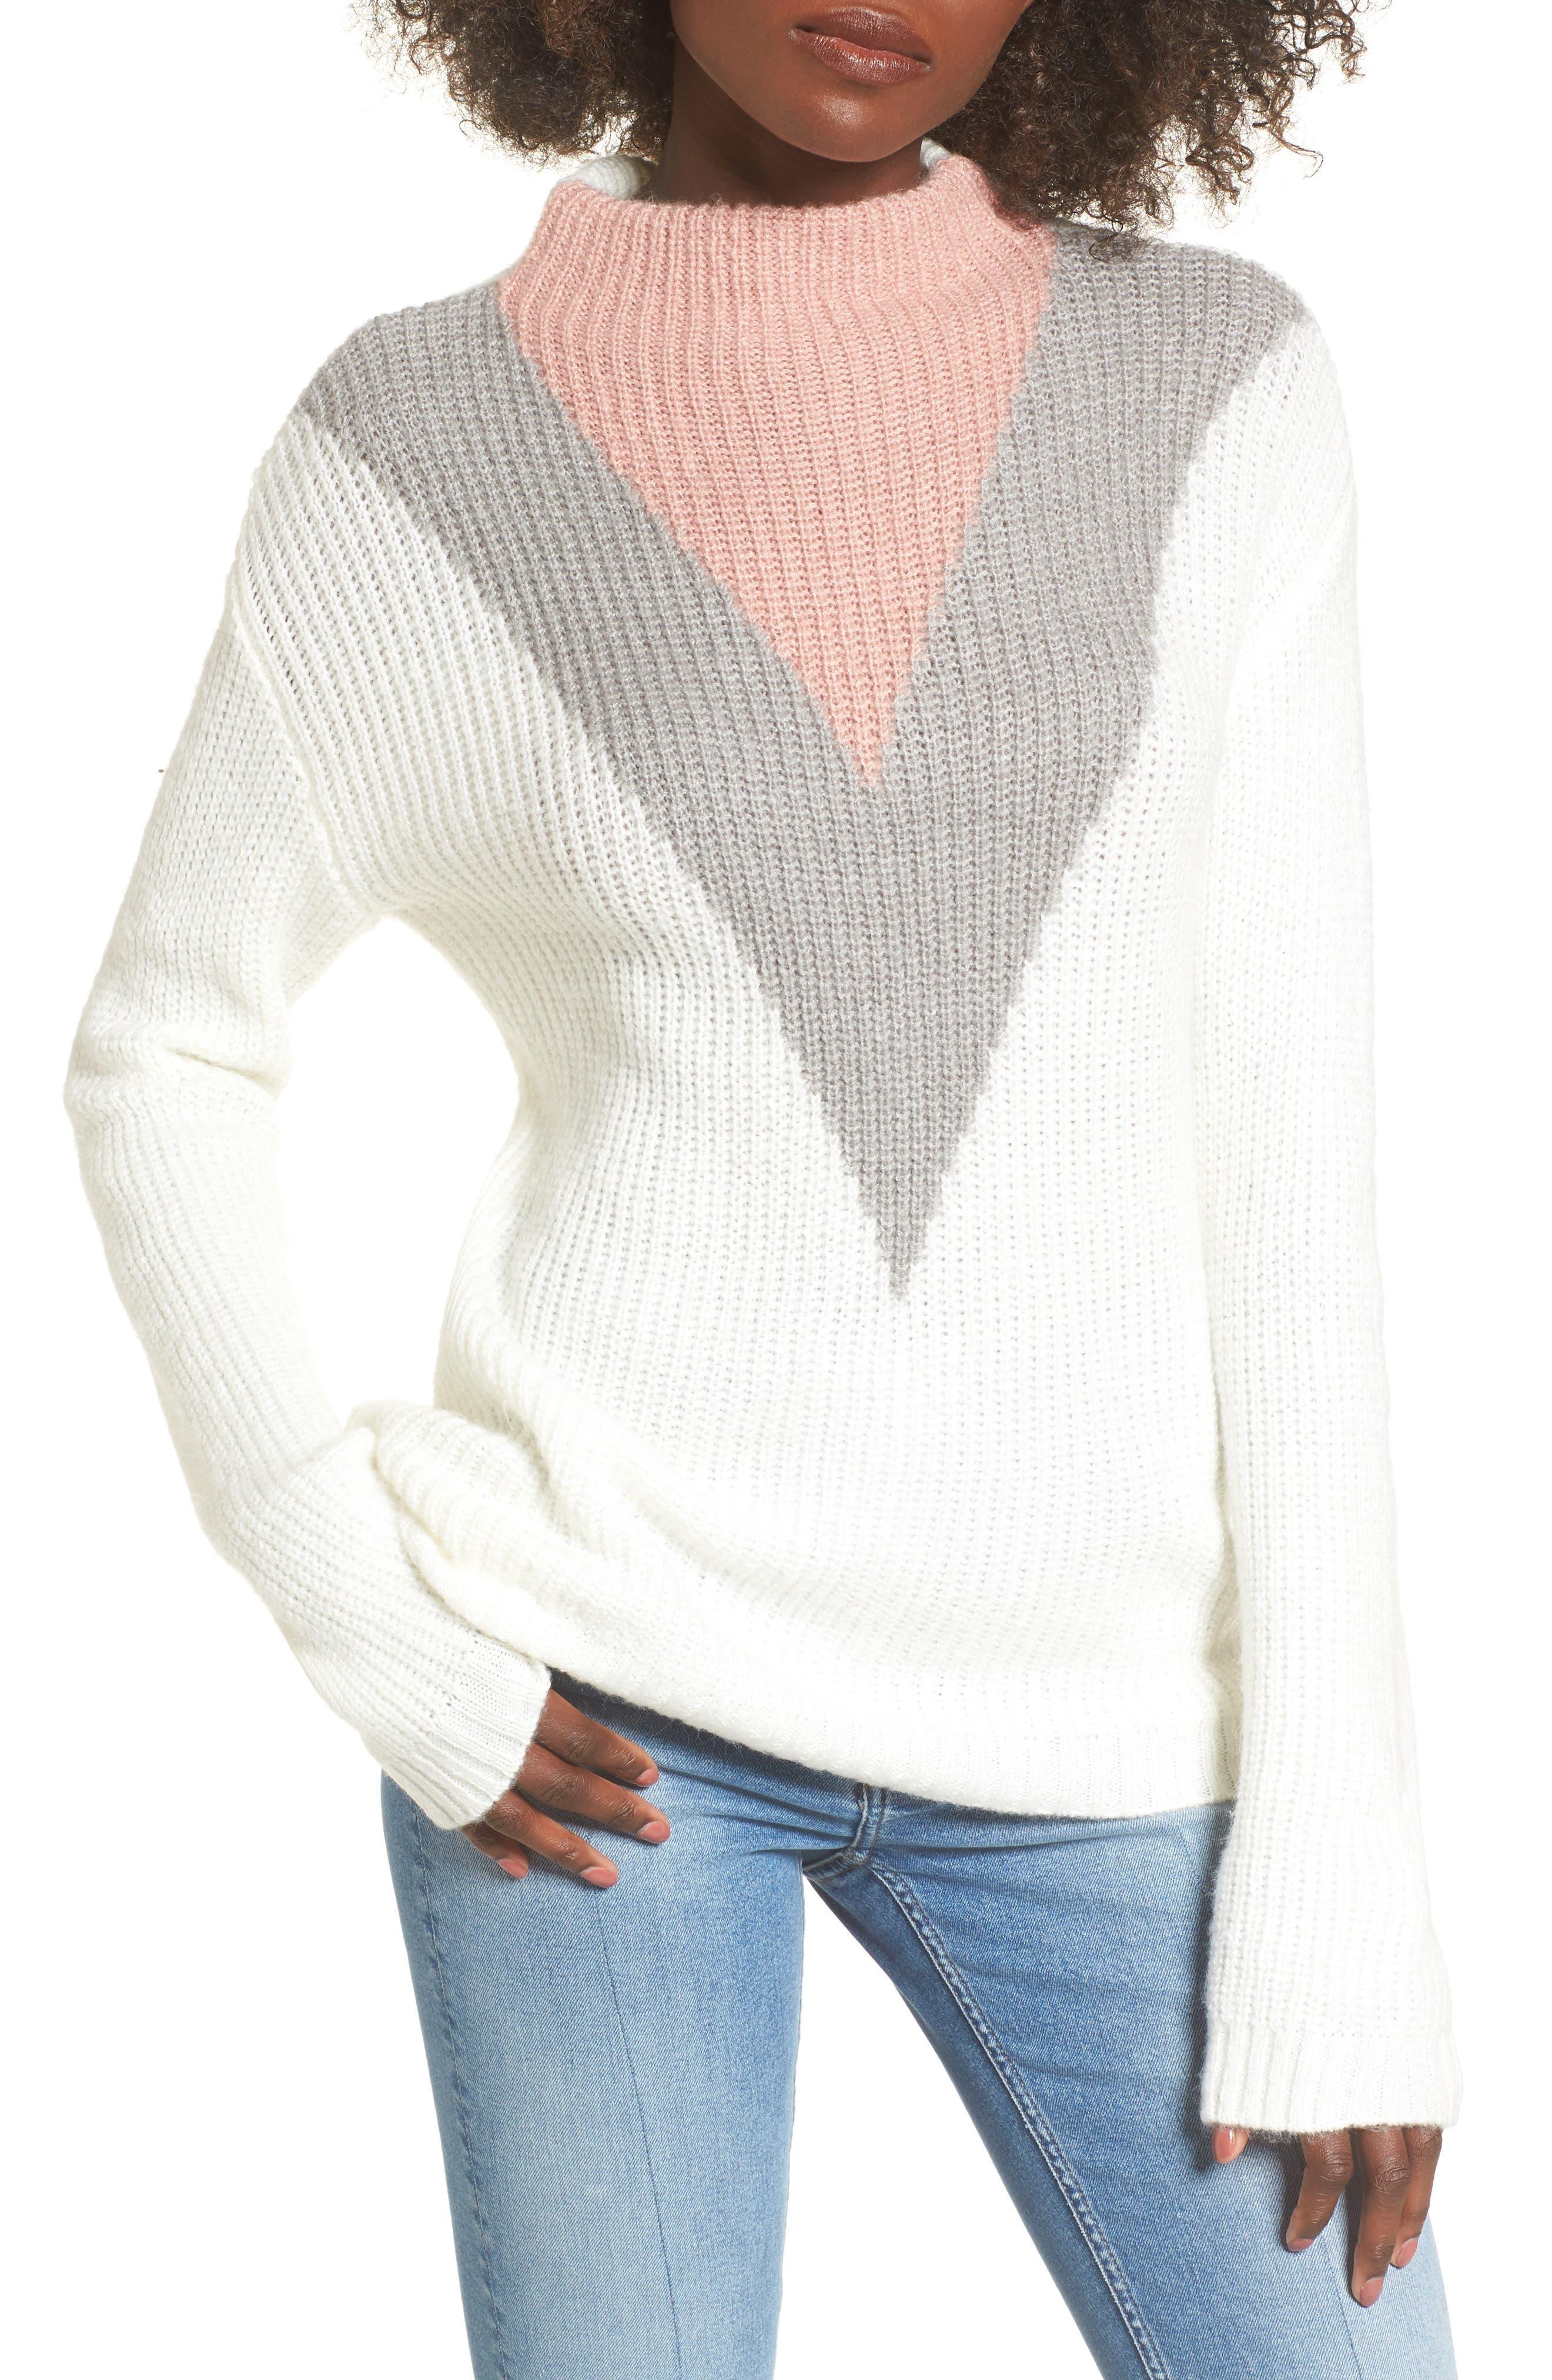 Main Image - Cotton Emporium Tri-Color Après Ski Sweater